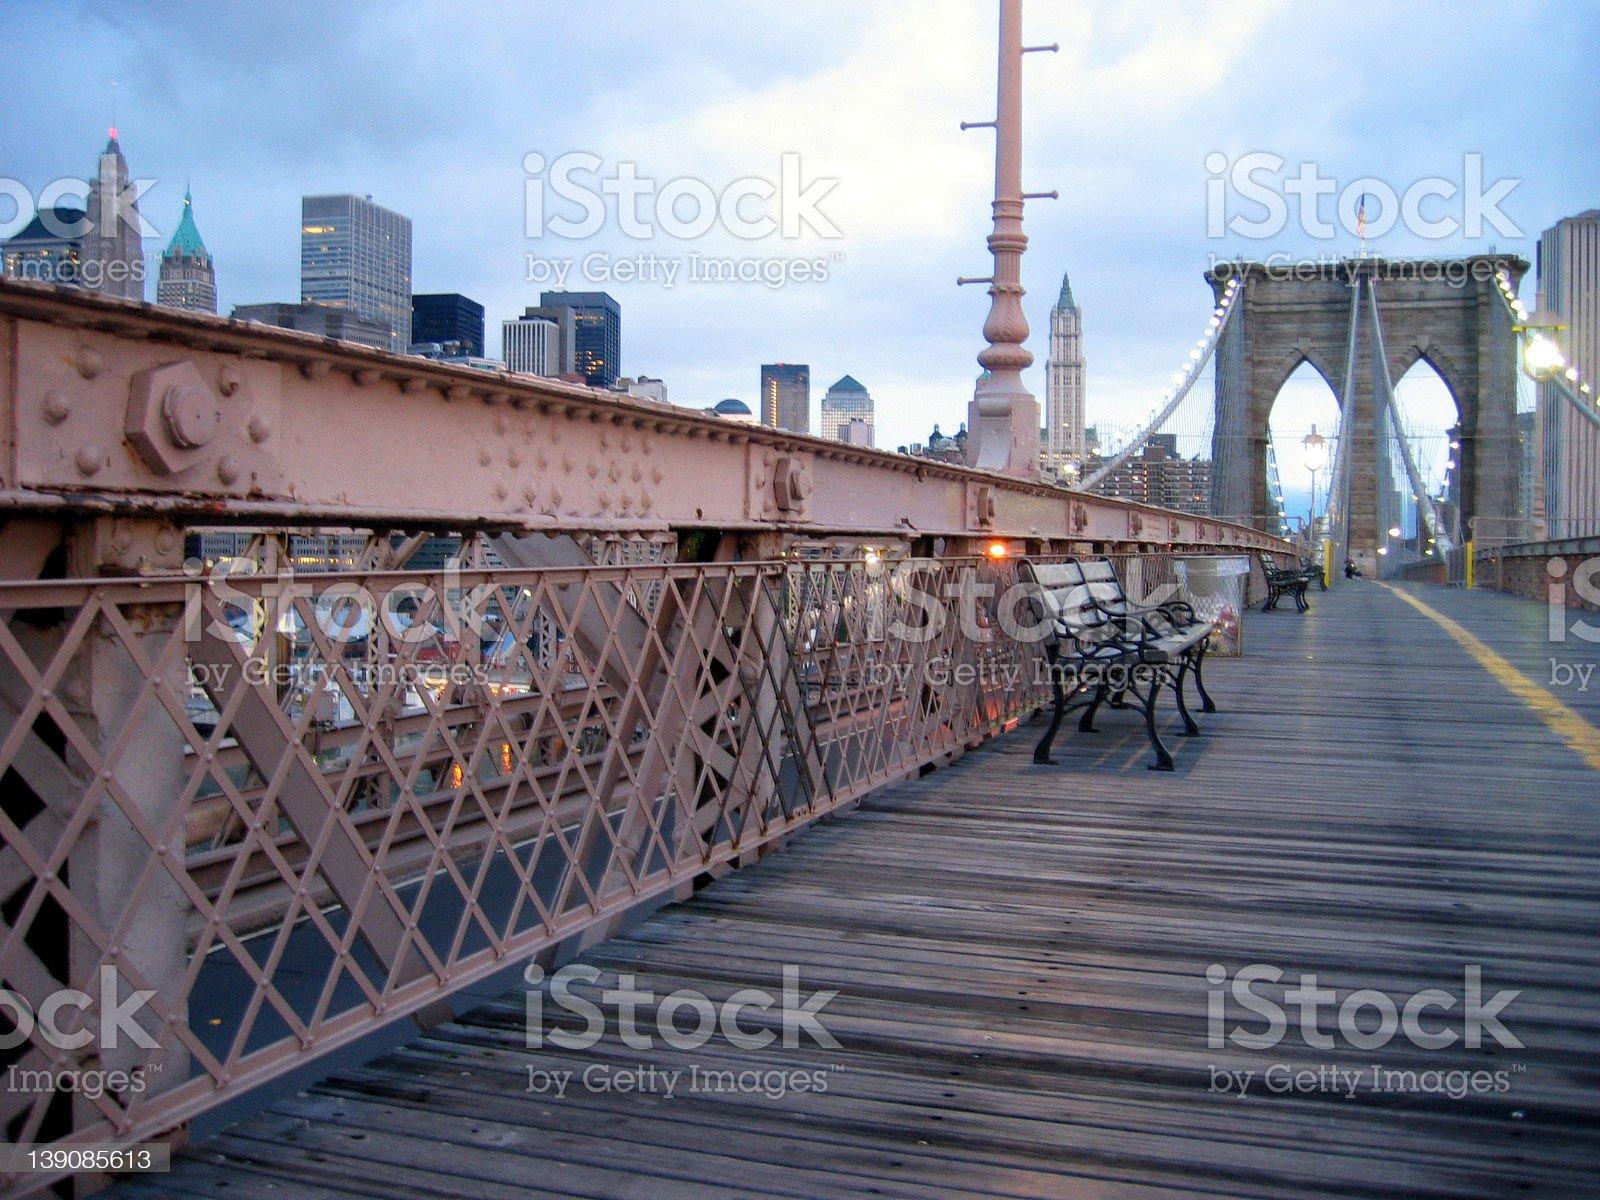 benches on the bridge royalty-free stock photo